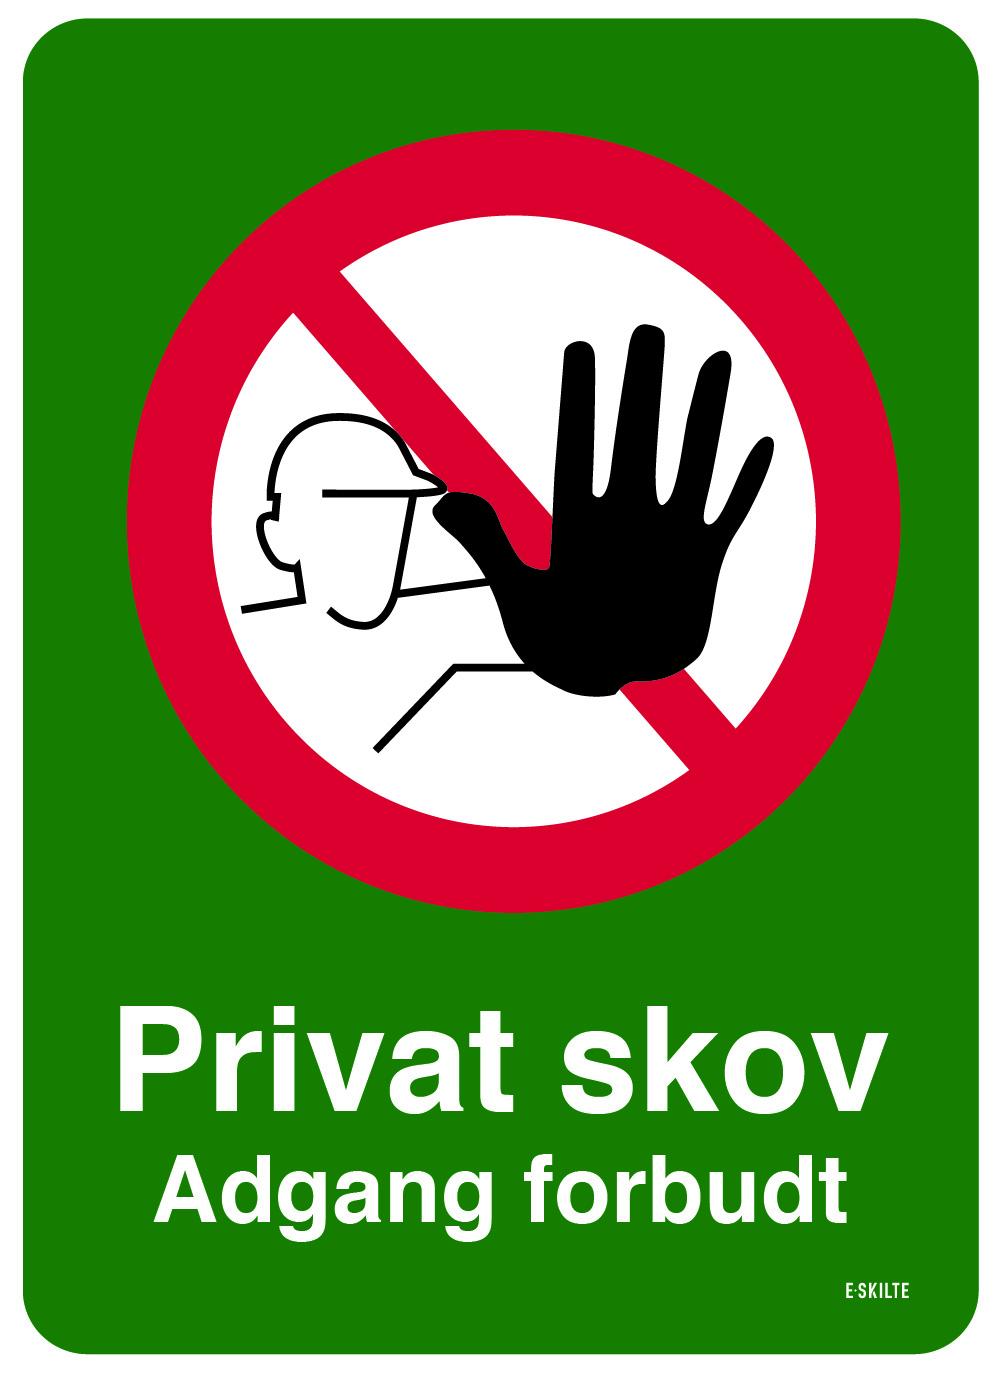 Privat skov Adgang forbudt skilt